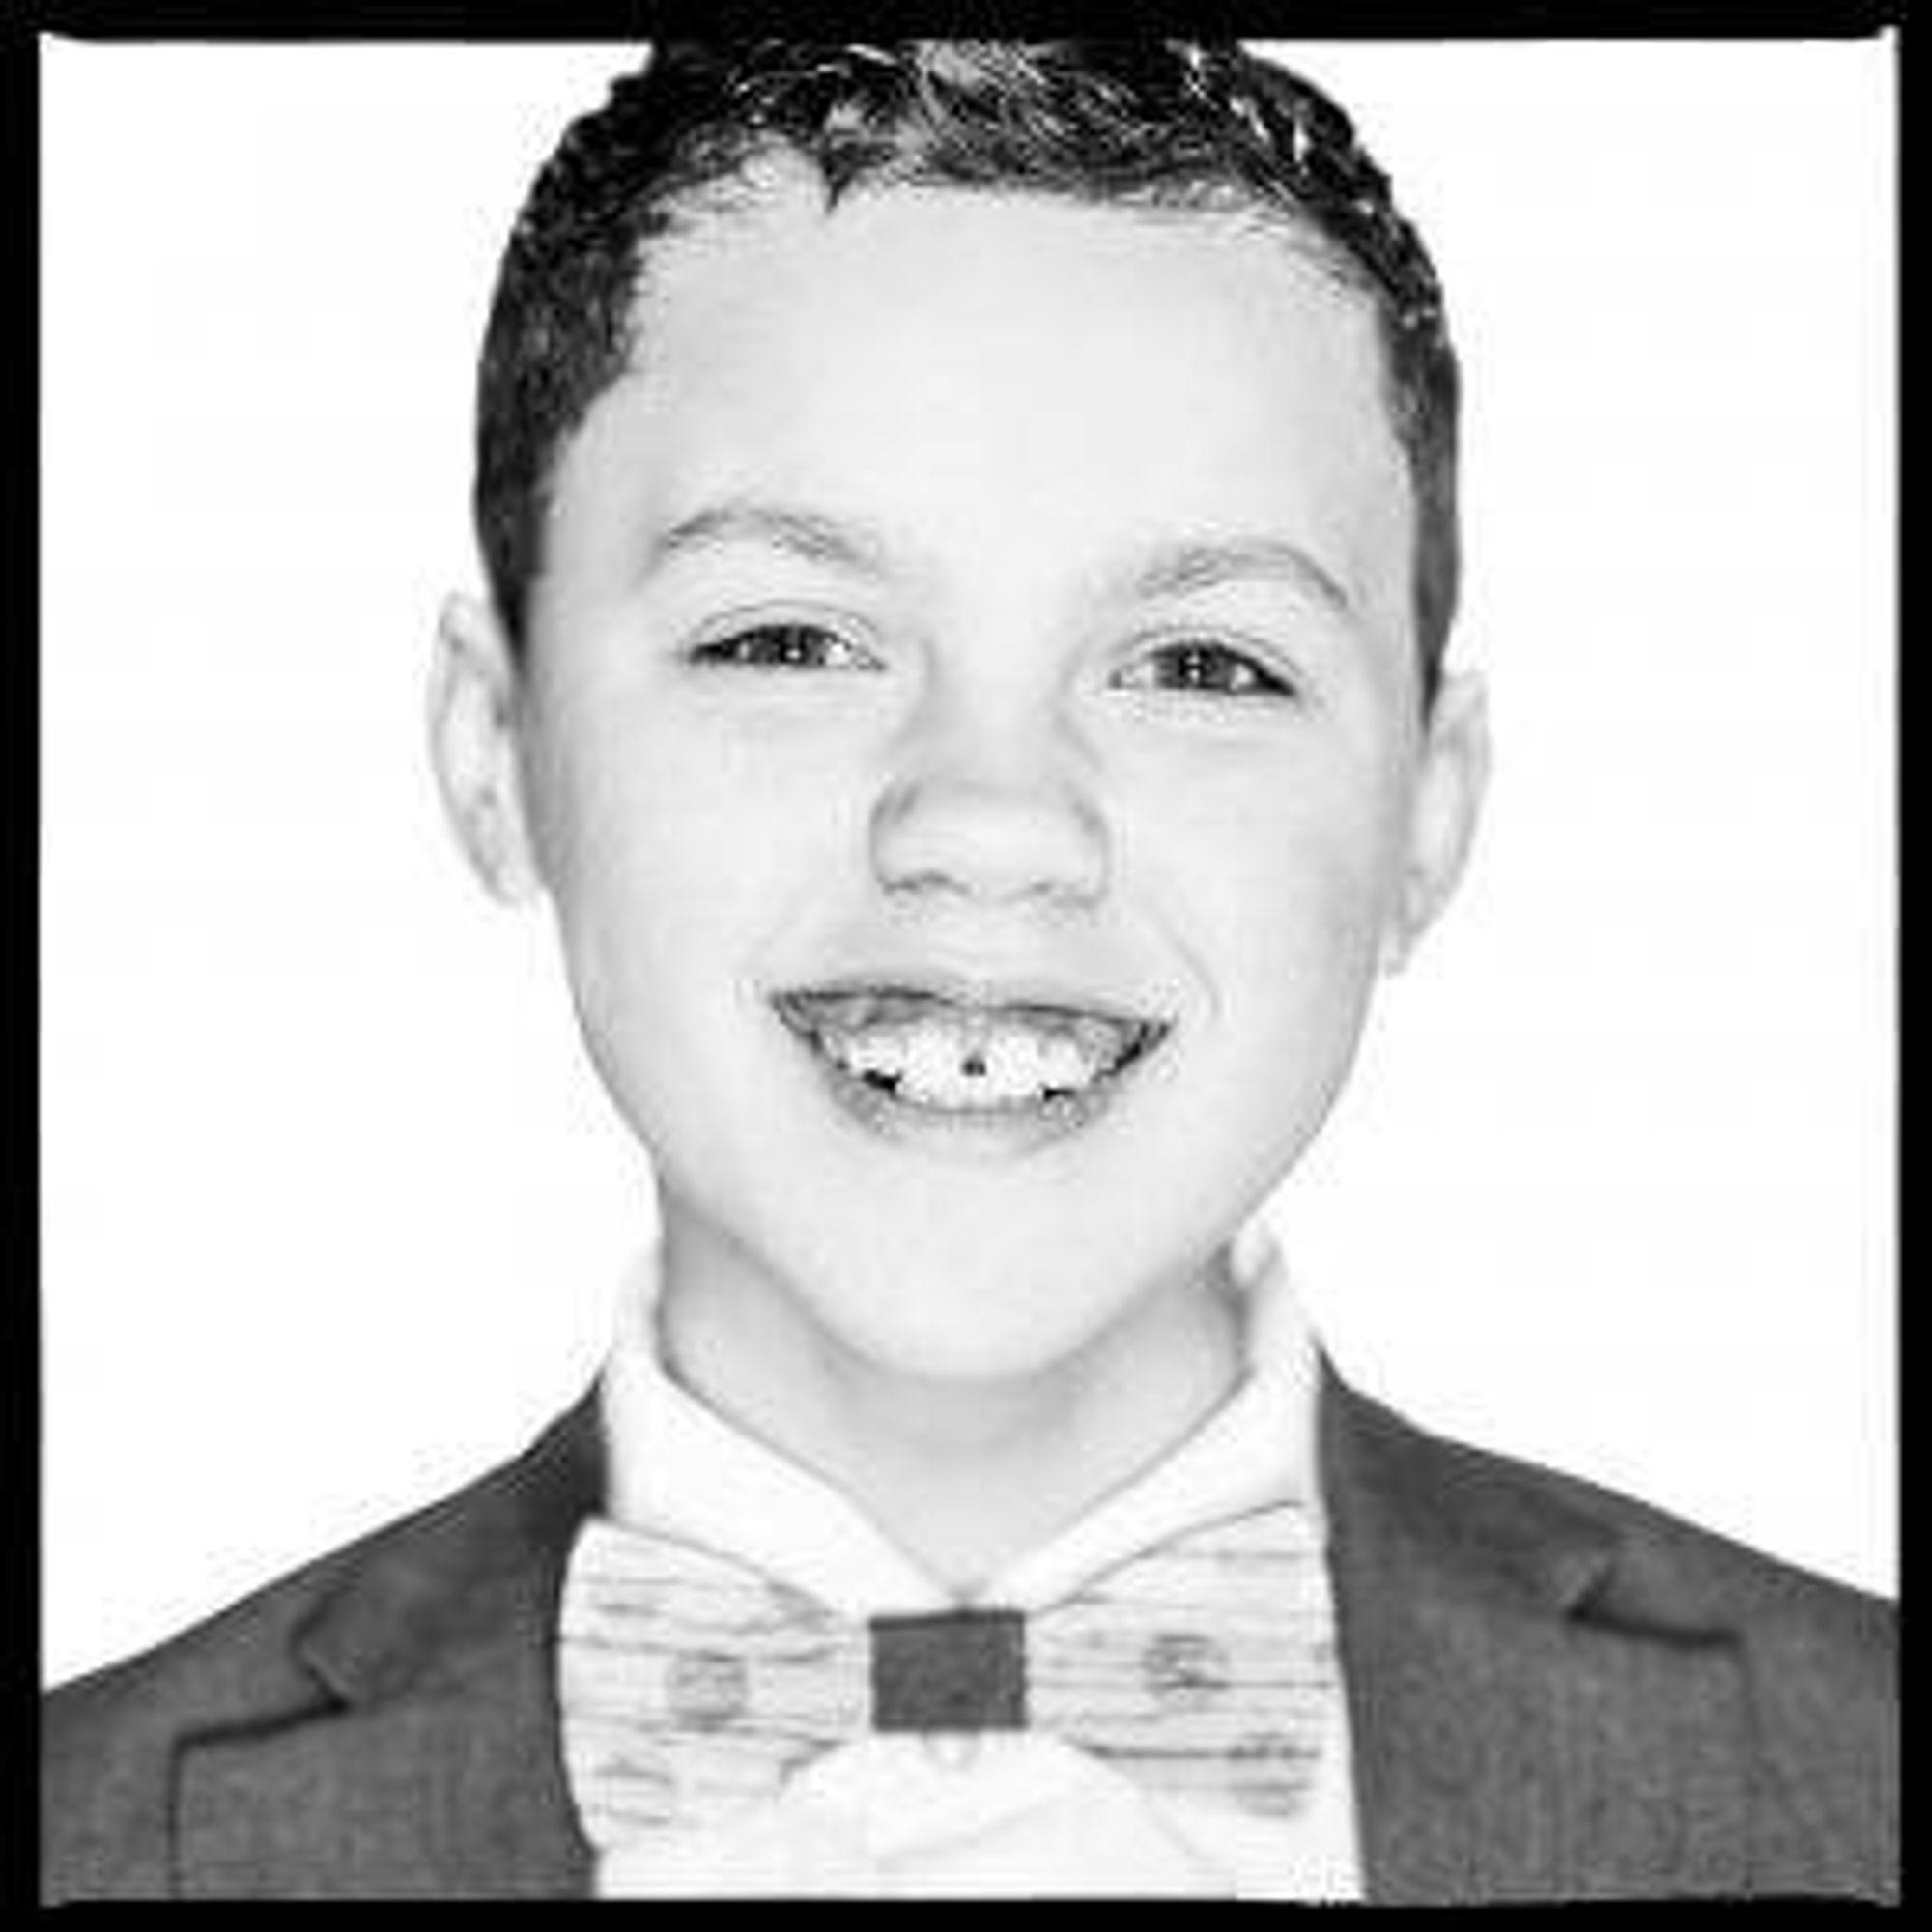 Portrait photograph of young person. Pronouns pbs rewire